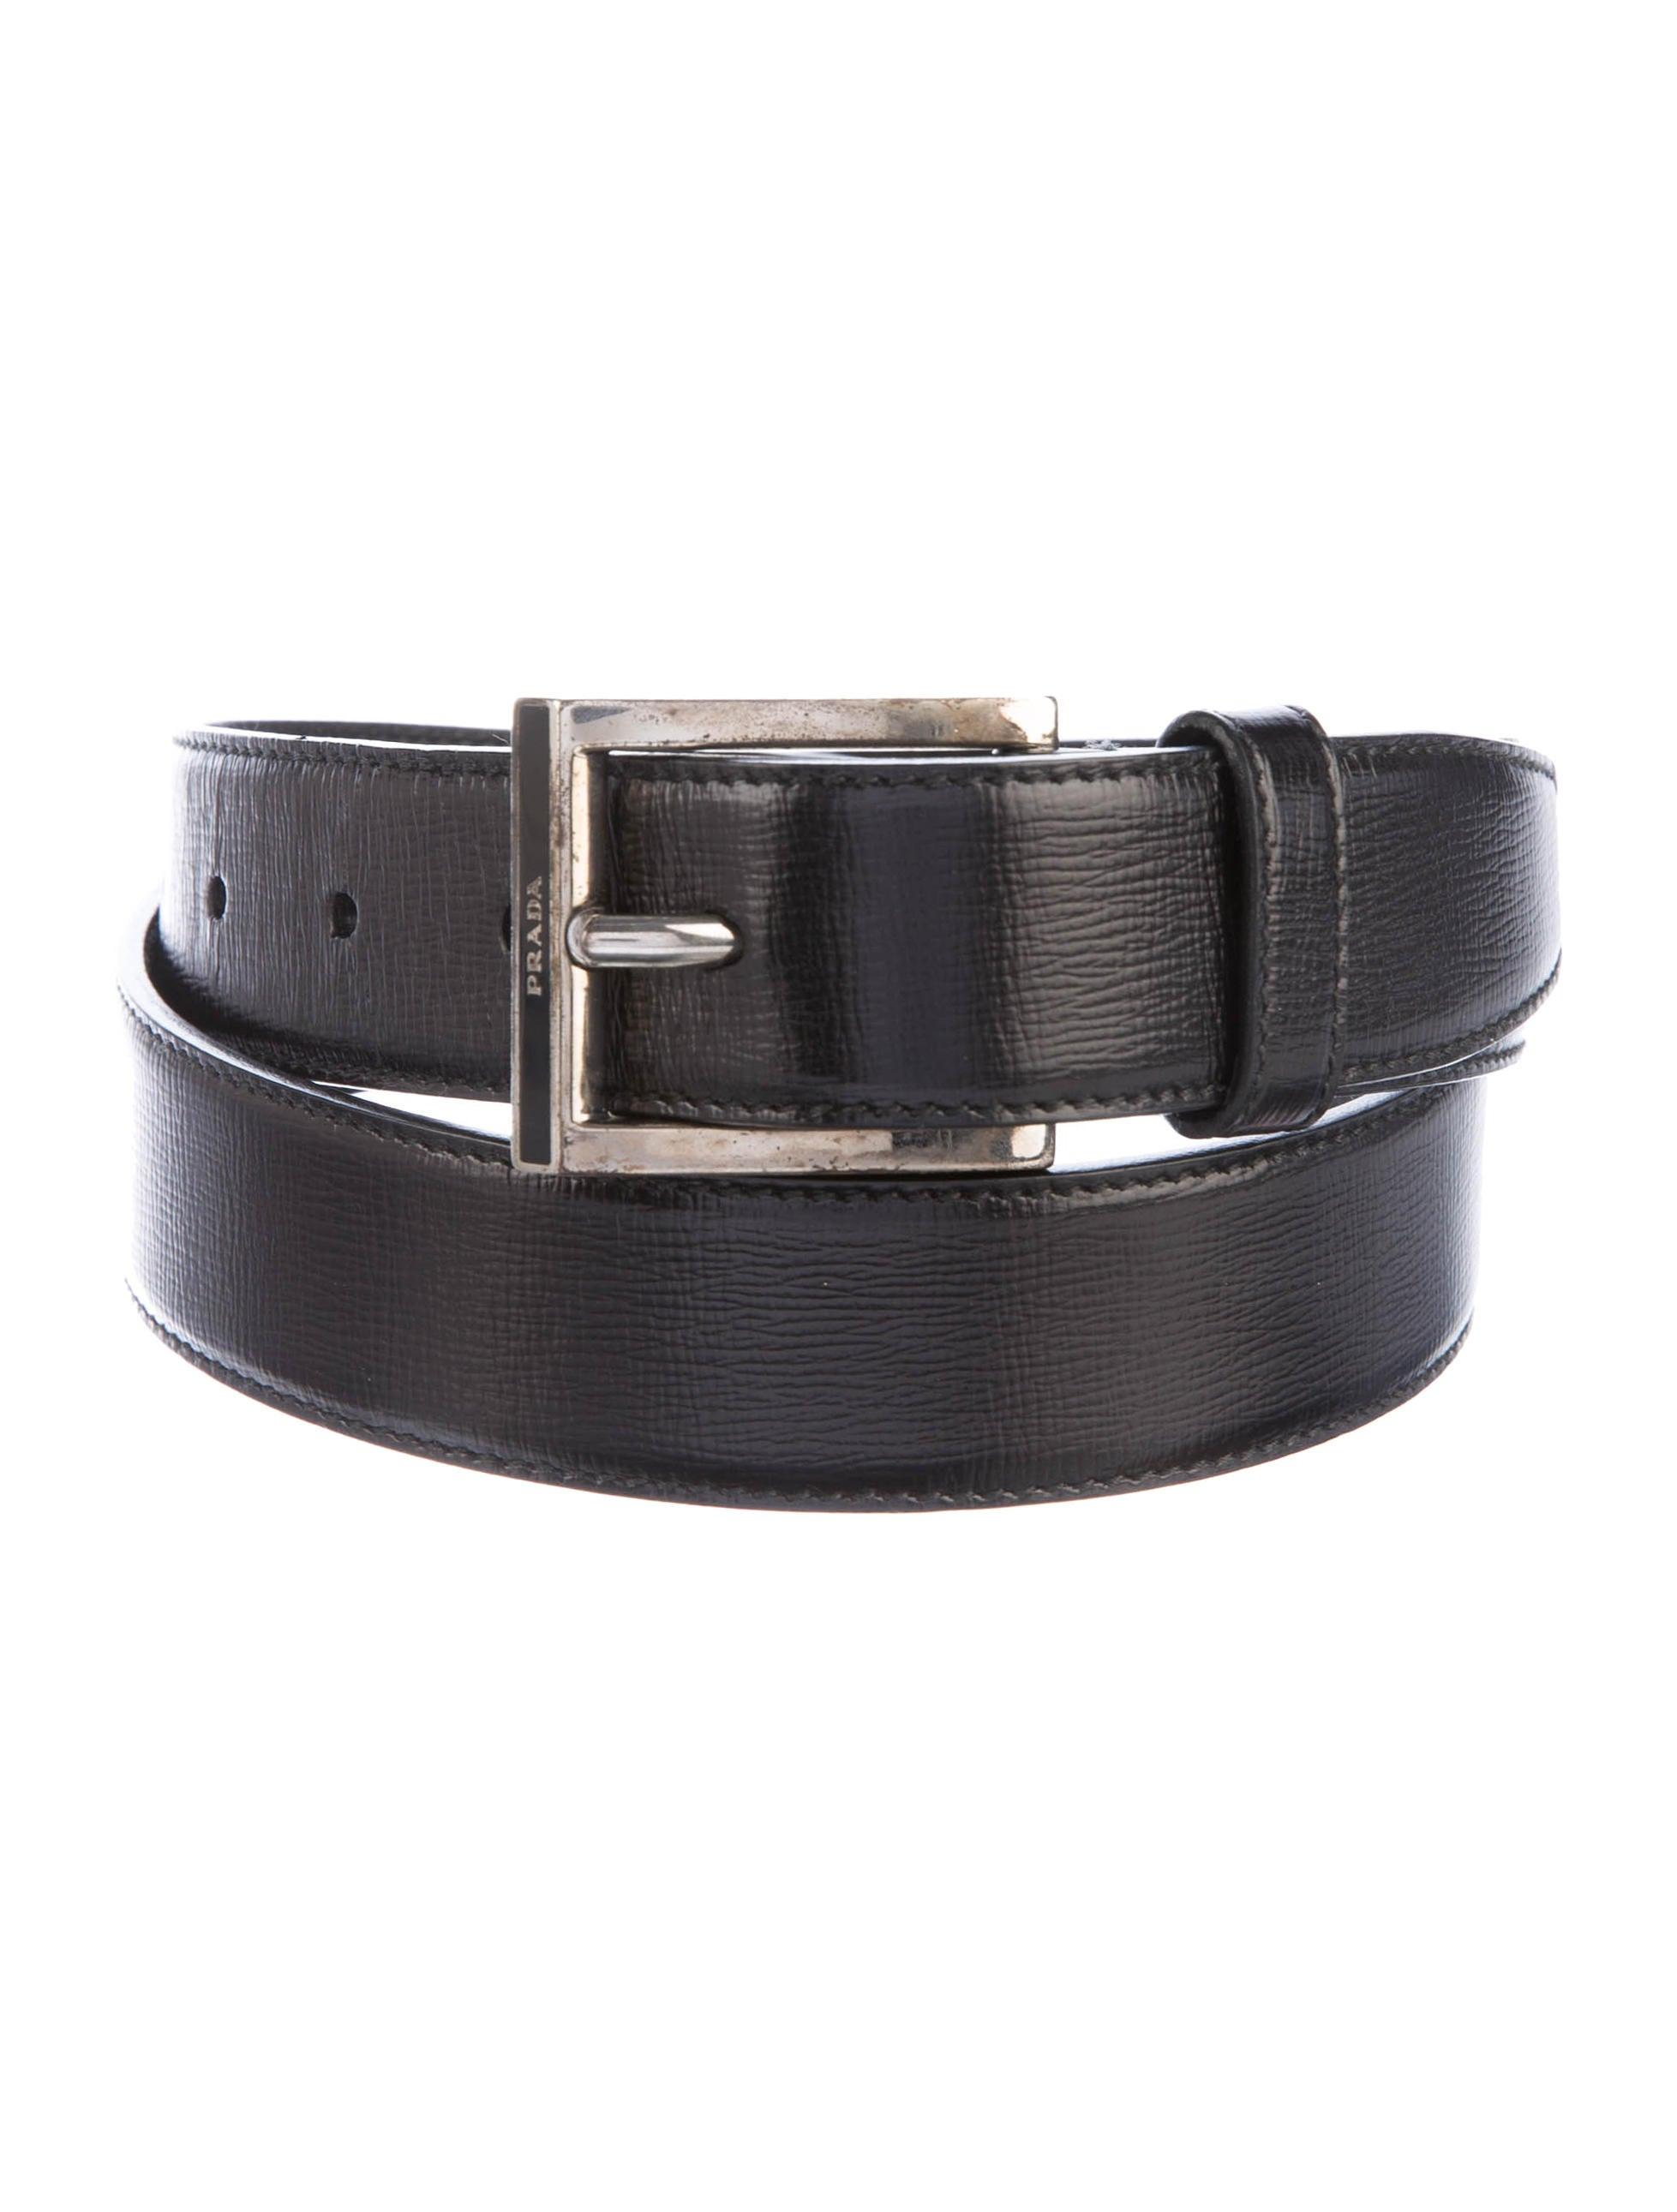 prada leather dress belt accessories pra144866 the